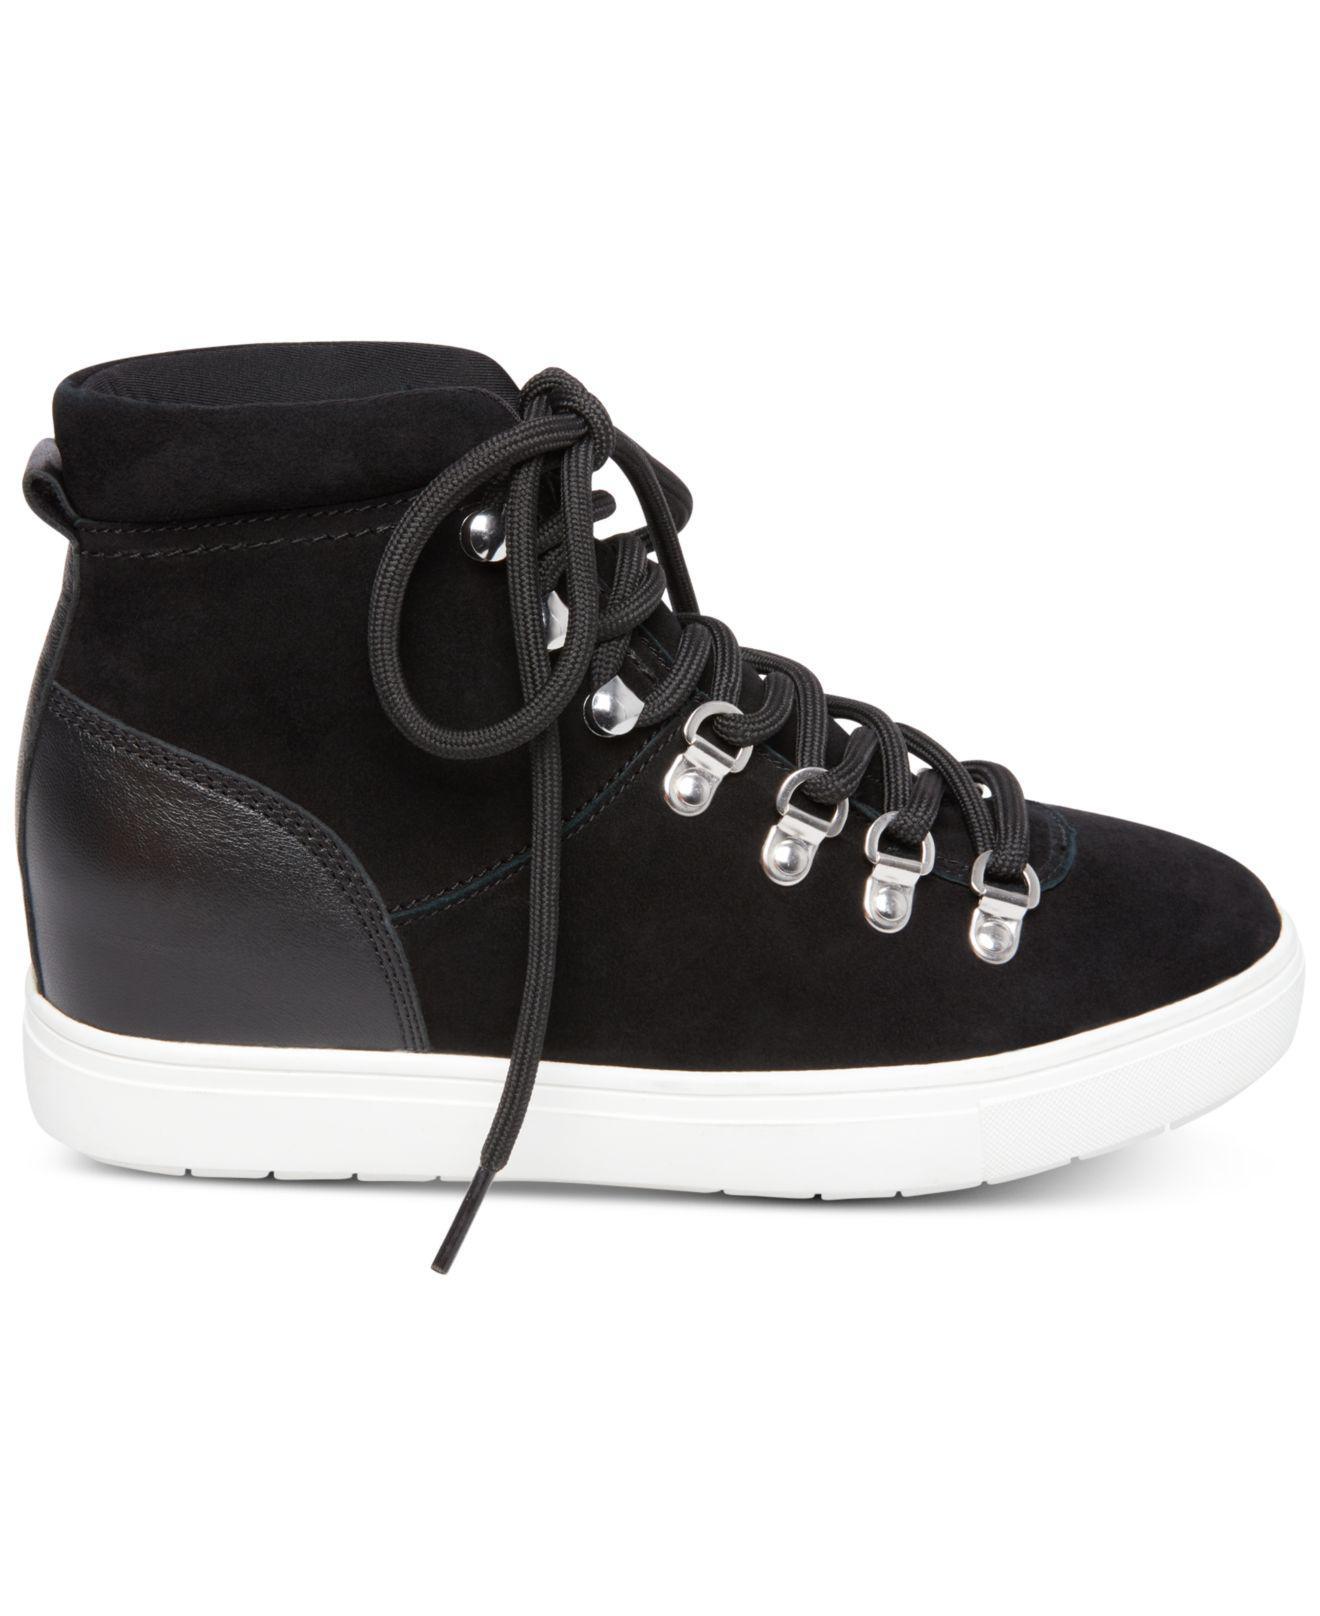 bf564490137 Lyst - Steven by Steve Madden Kalea Sneaker in Black - Save 80%